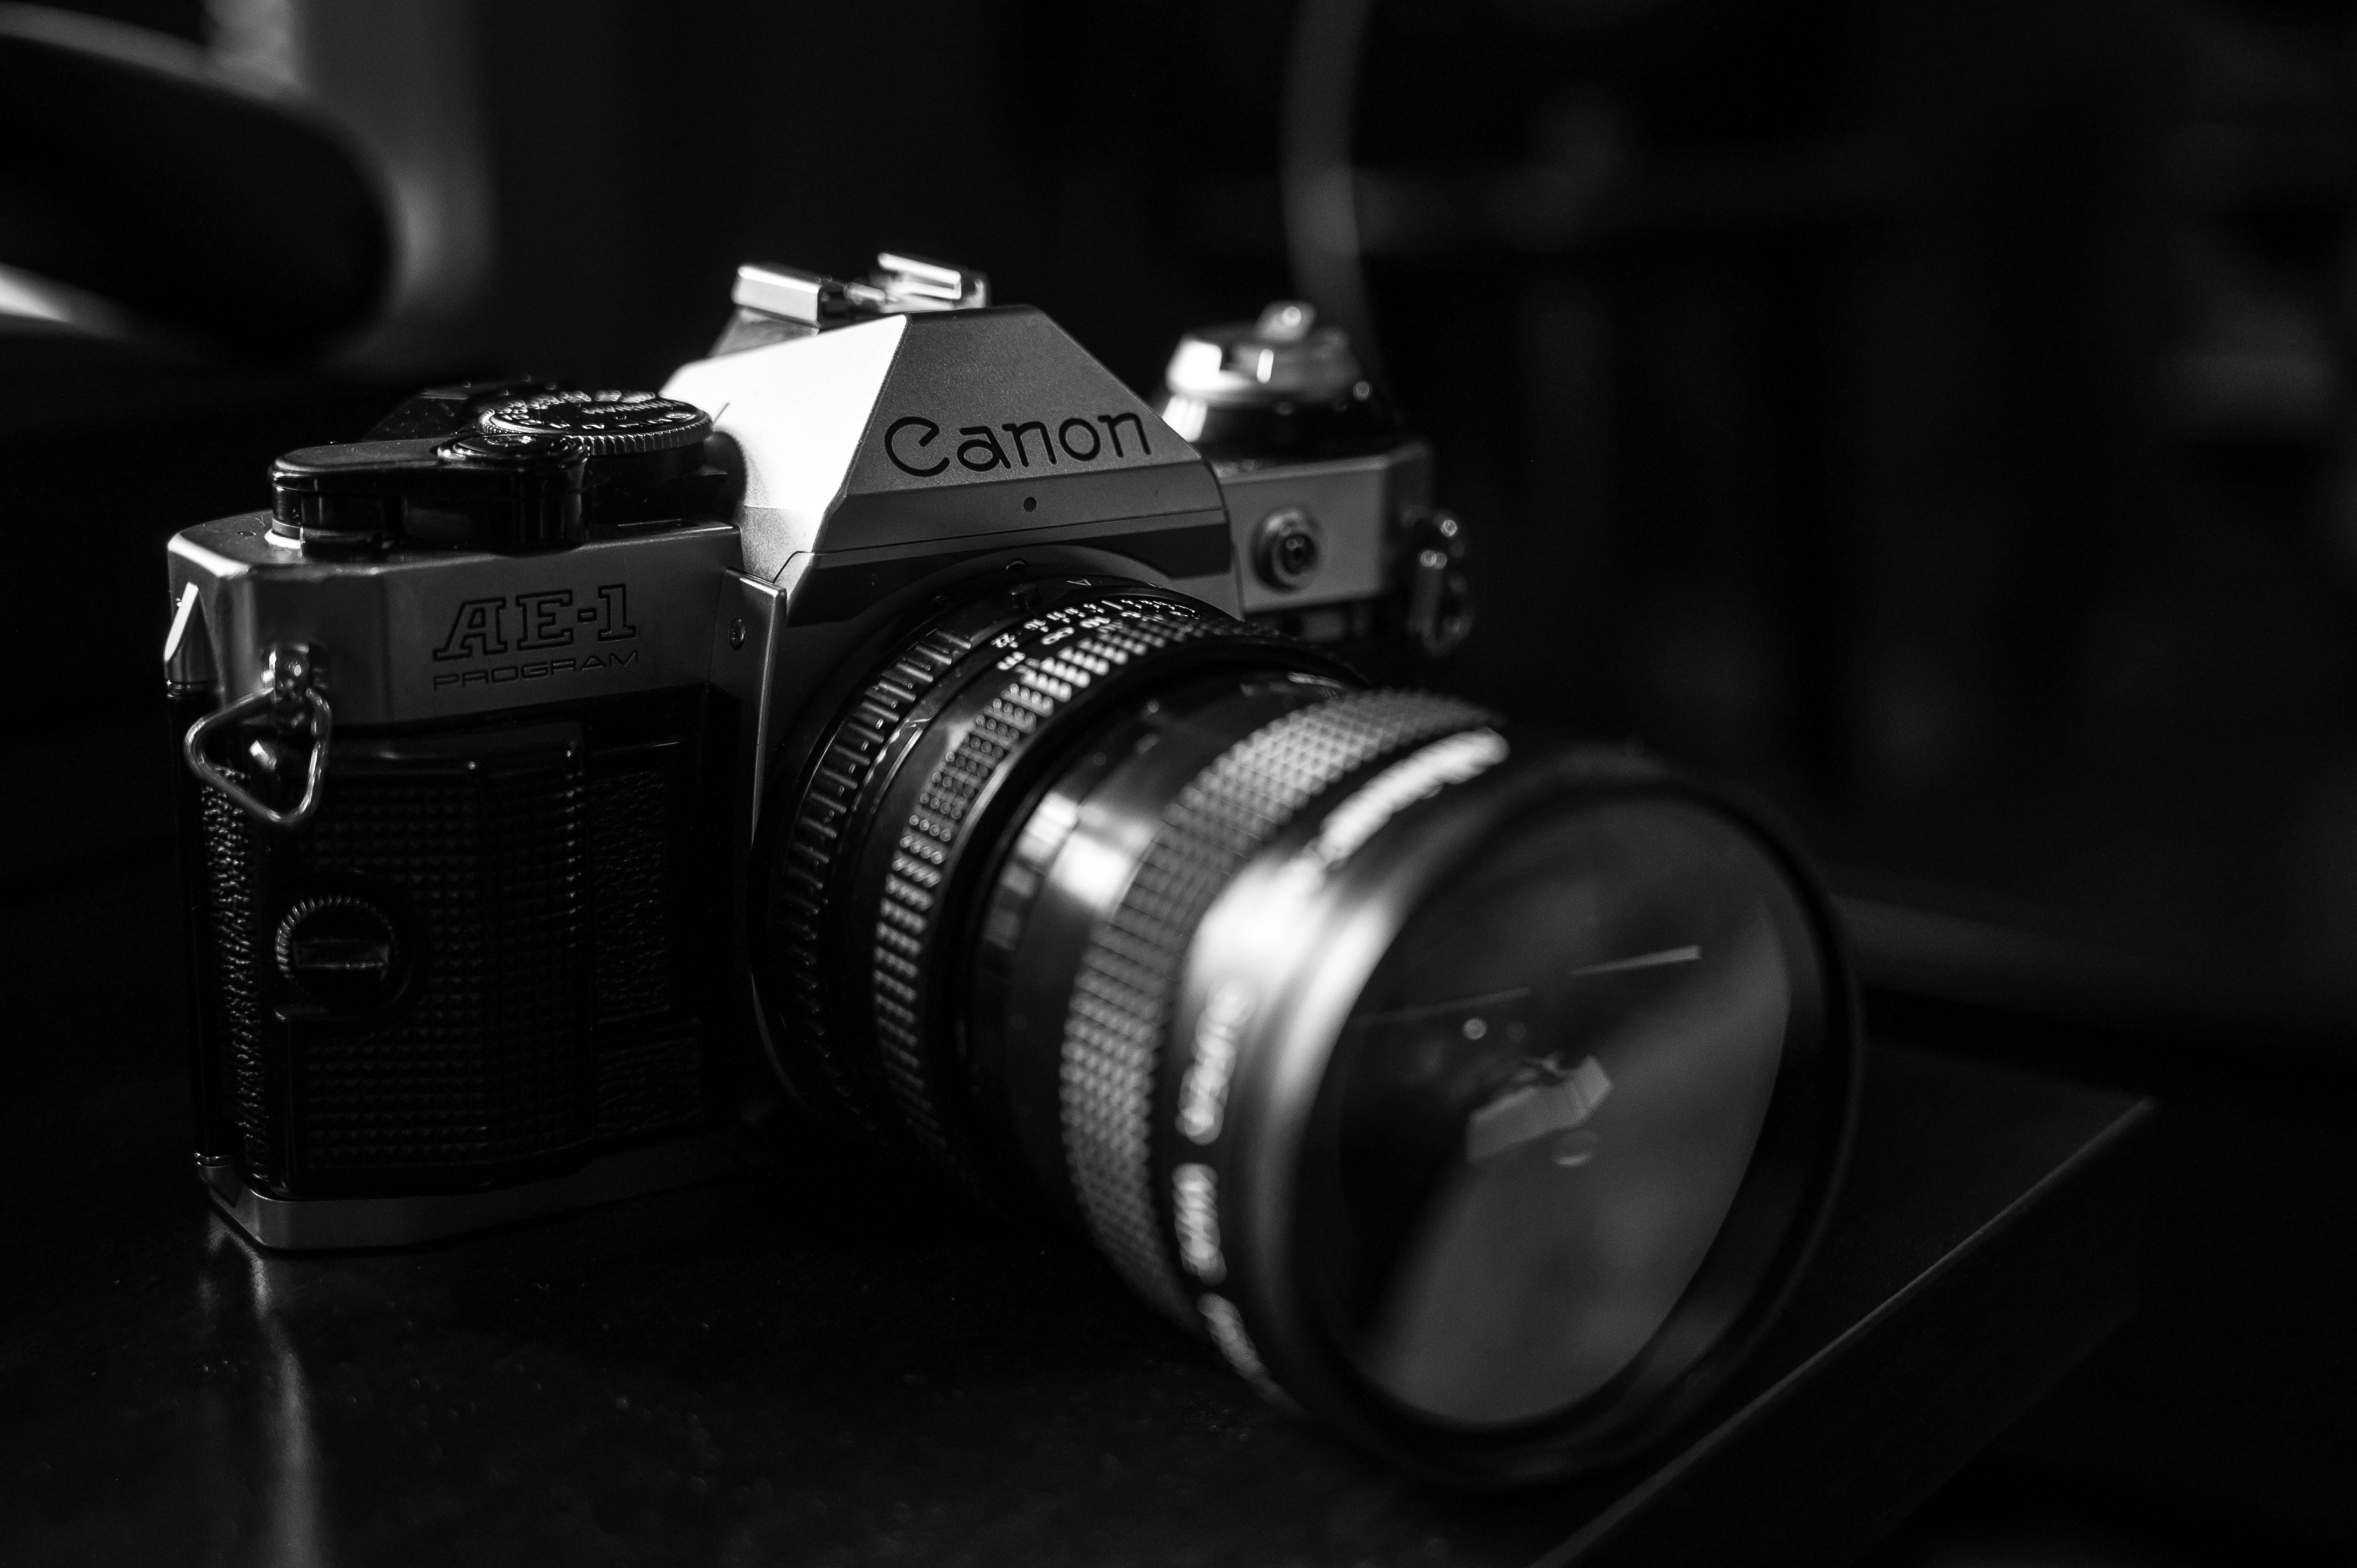 Gratis stockfoto met camera, cameralens, canon, close-up